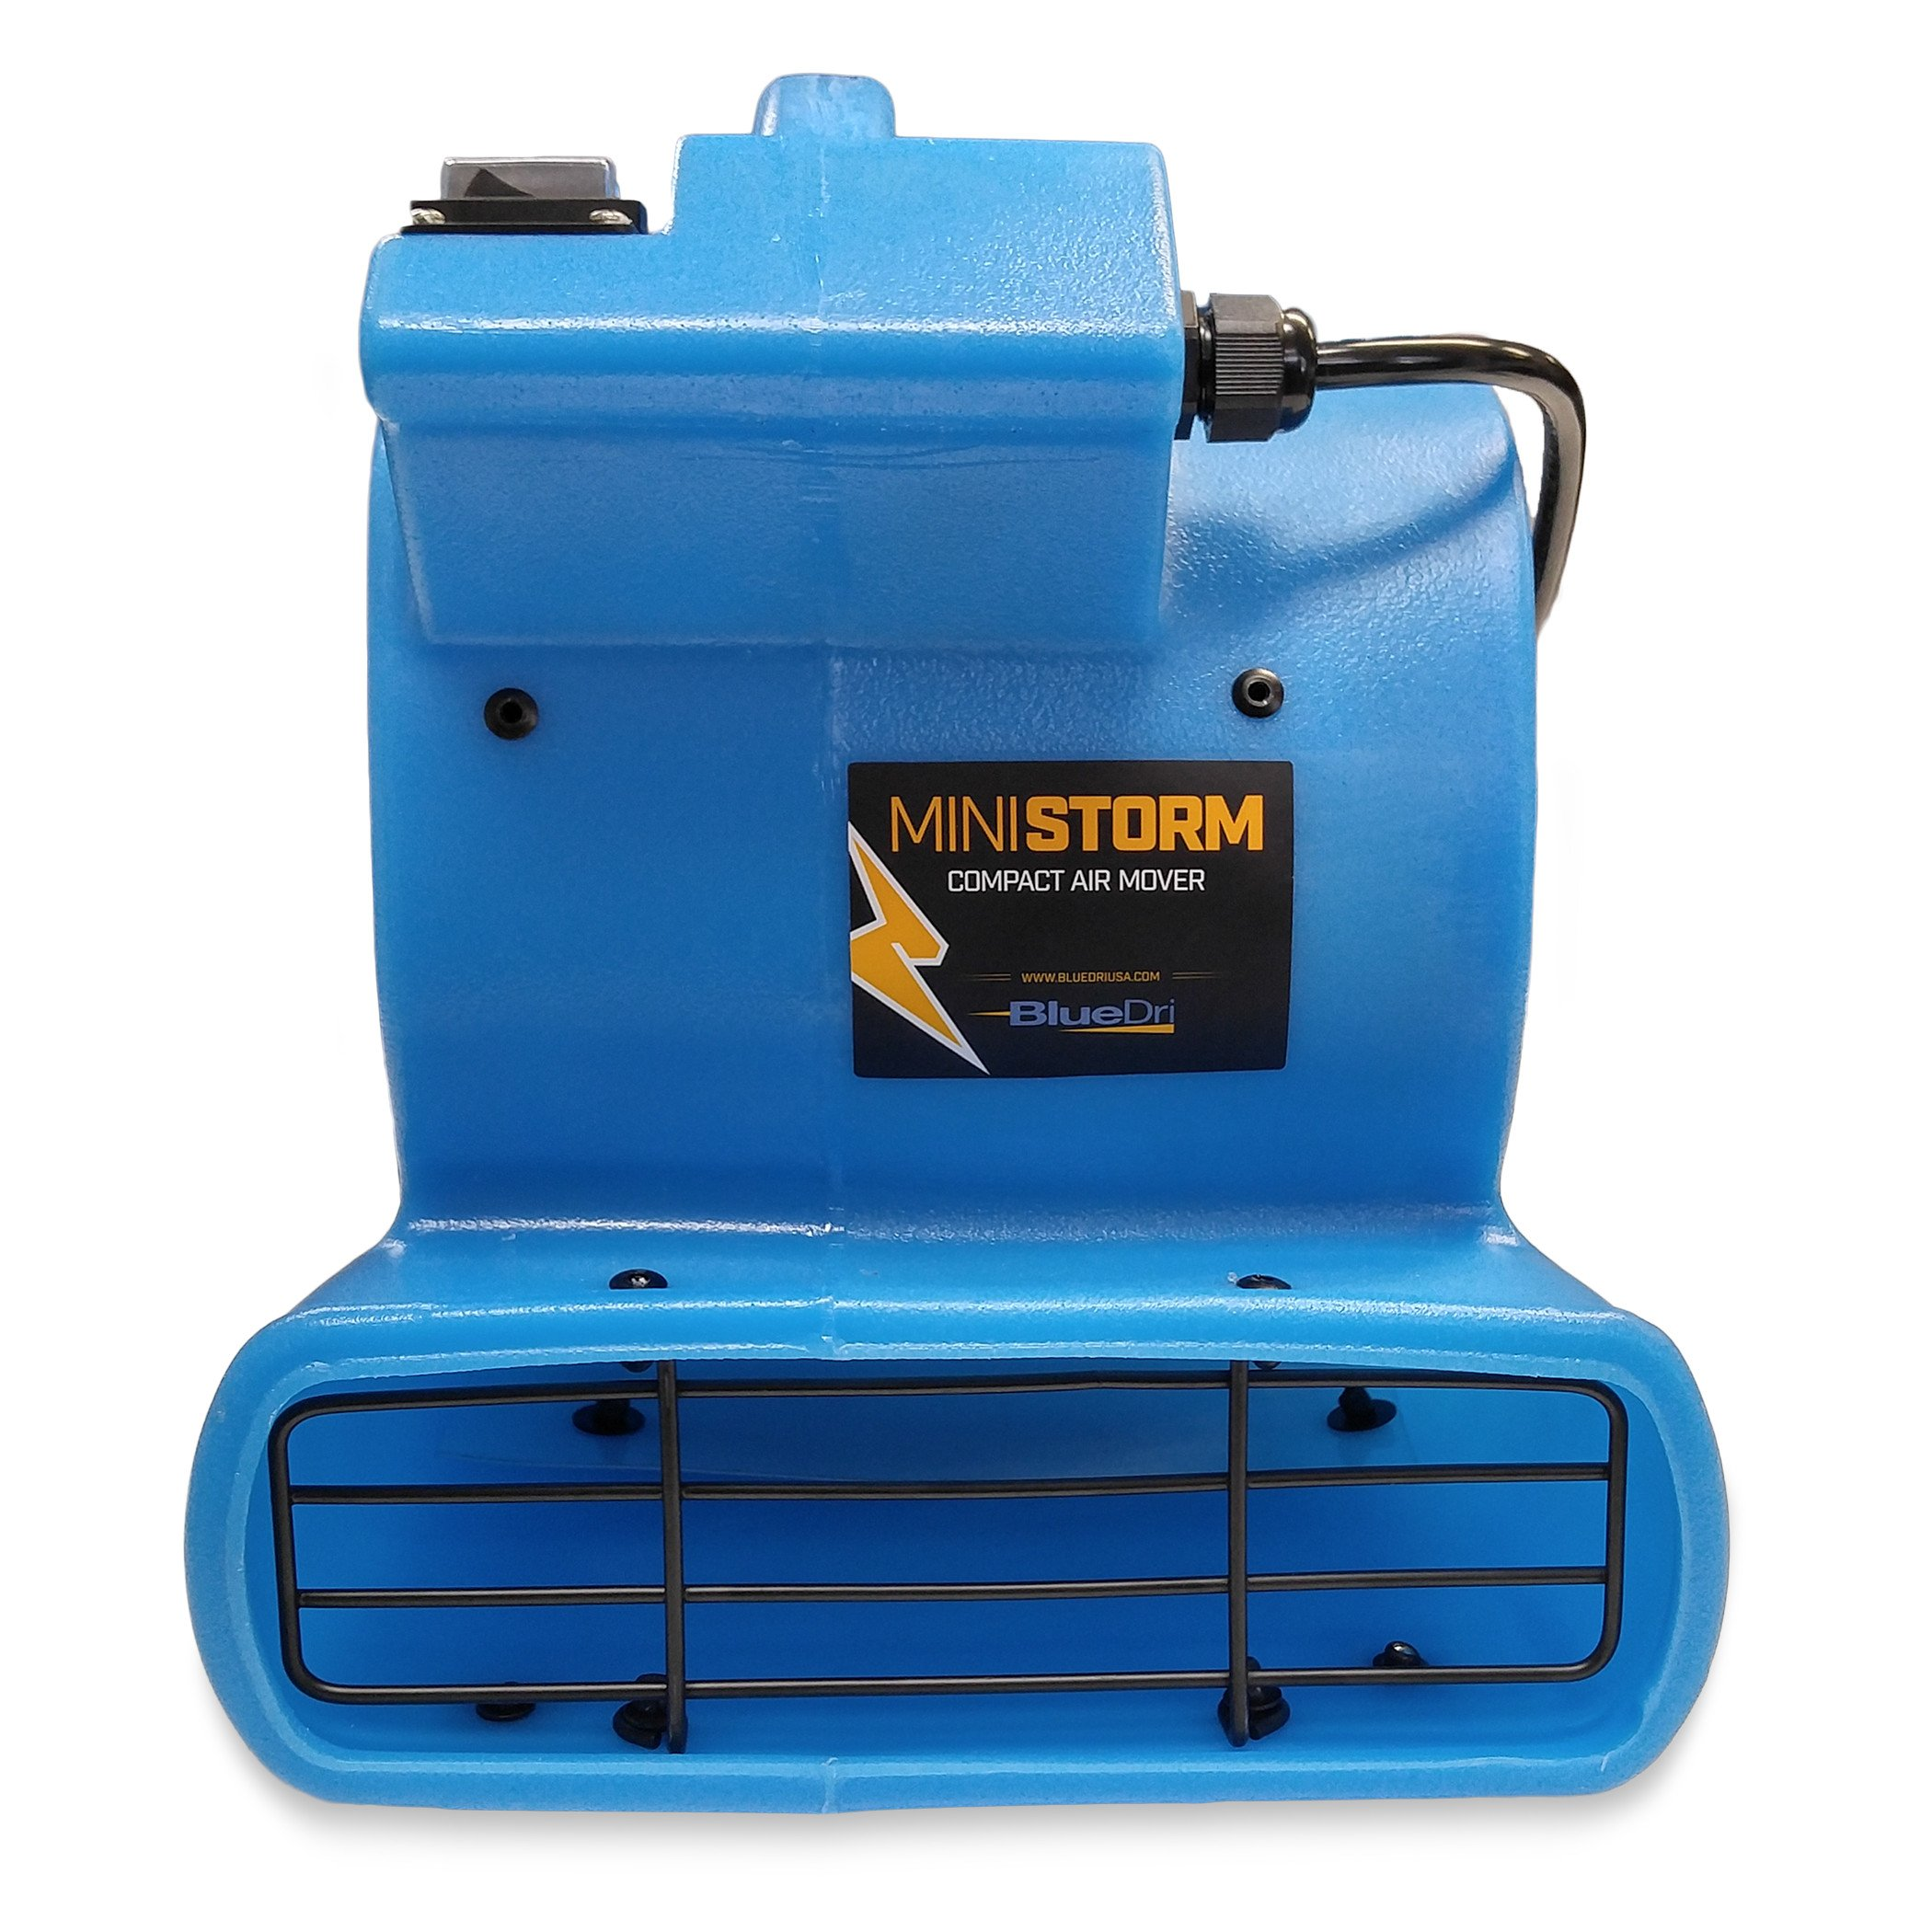 BlueDri Mini Storm 1/12 HP Mini Air Mover Carpet Dryer Floor Squirrel Cage Blower Fan for Home Floors and Carpets, Blue (SA-MI-BL)